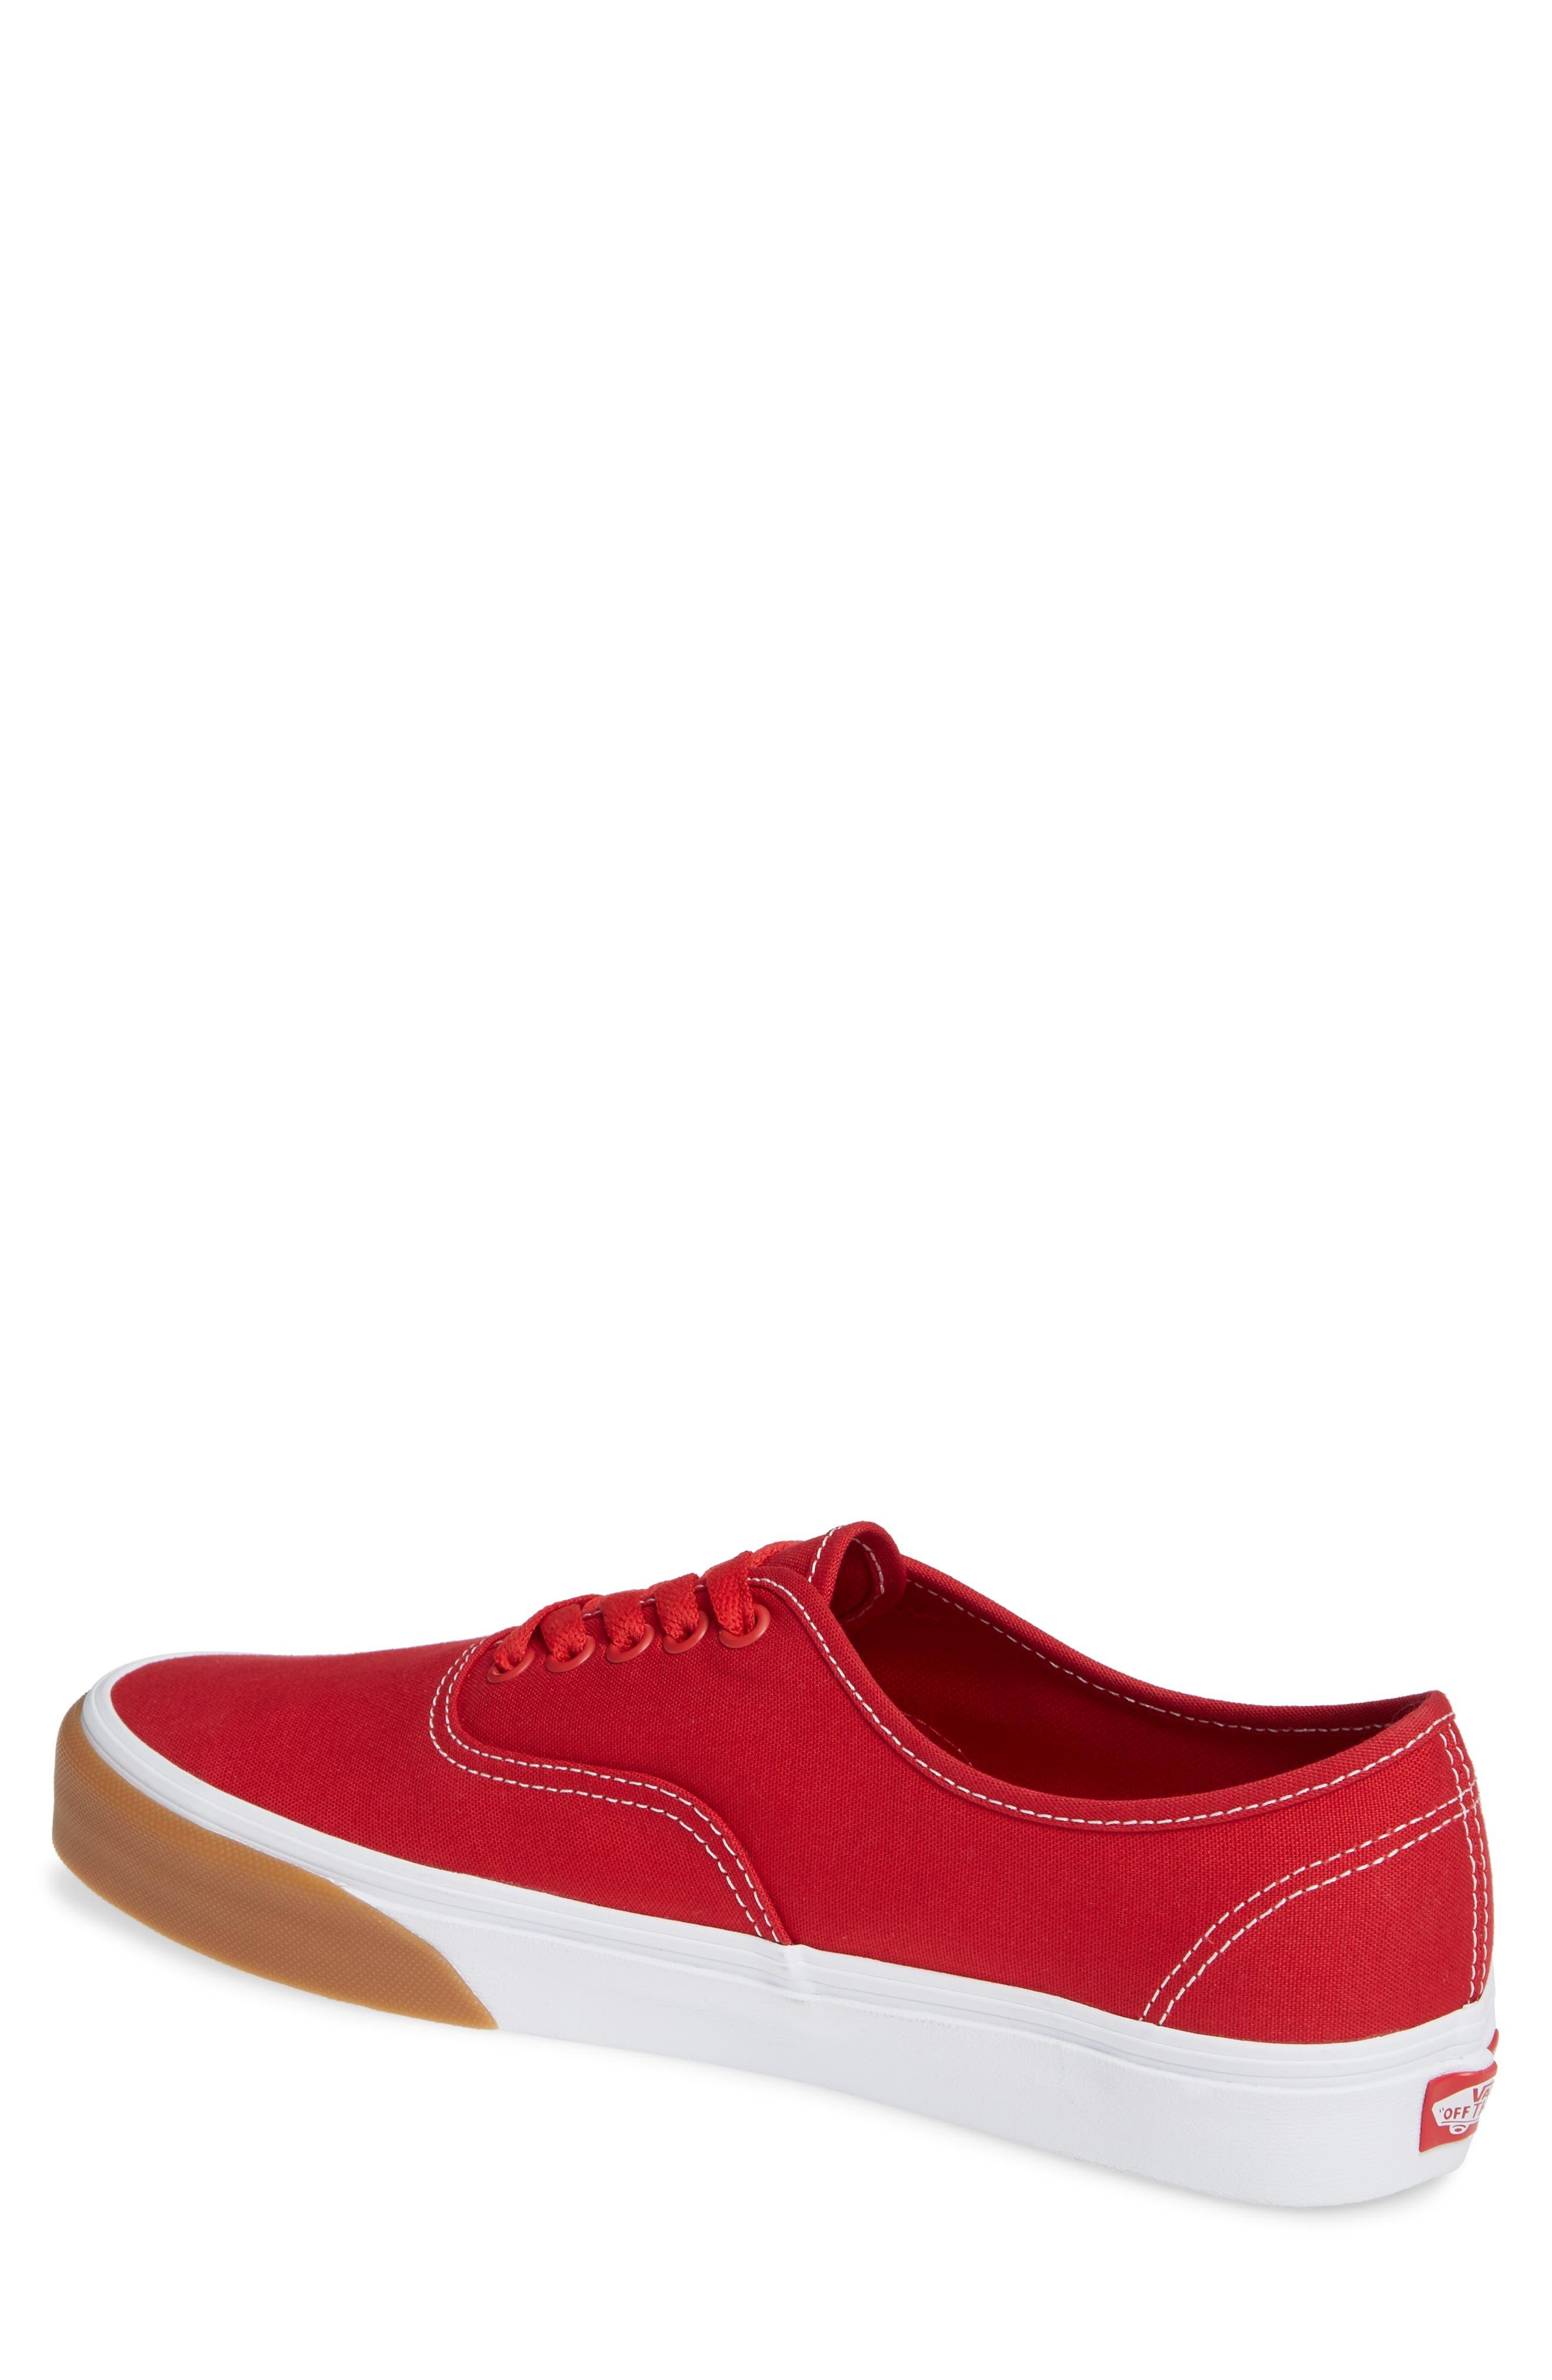 Authentic Gum Bumper Sneaker,                             Alternate thumbnail 2, color,                             Red/ True White